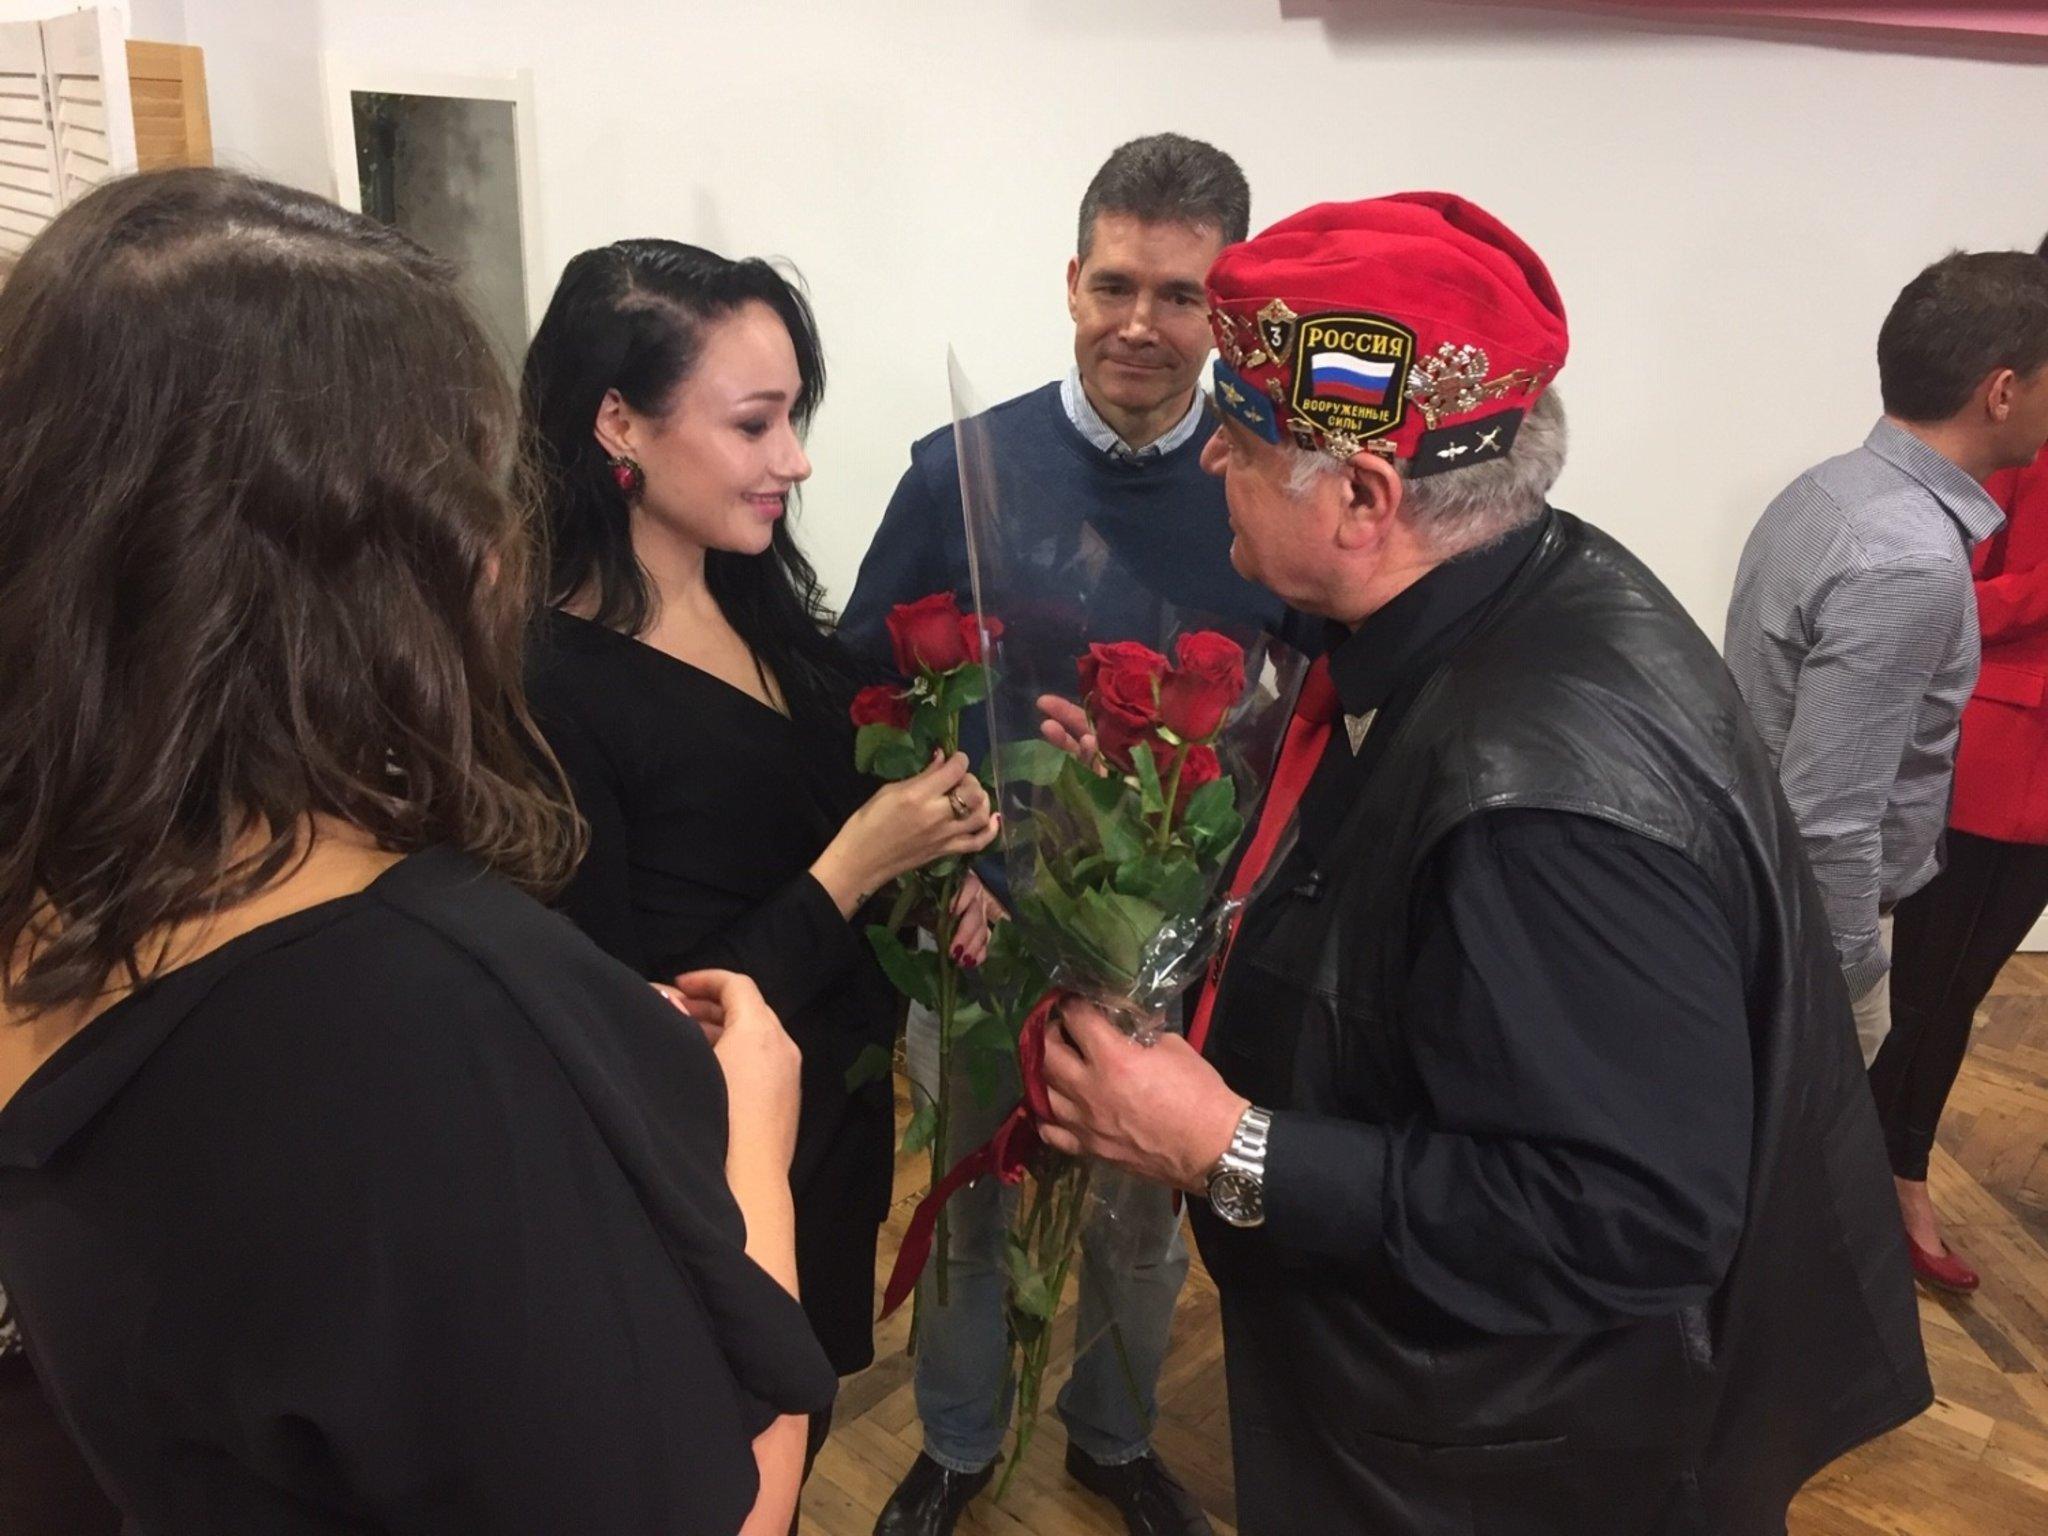 Flirt & Abenteuer Sieghartskirchen | Locanto Casual Dating